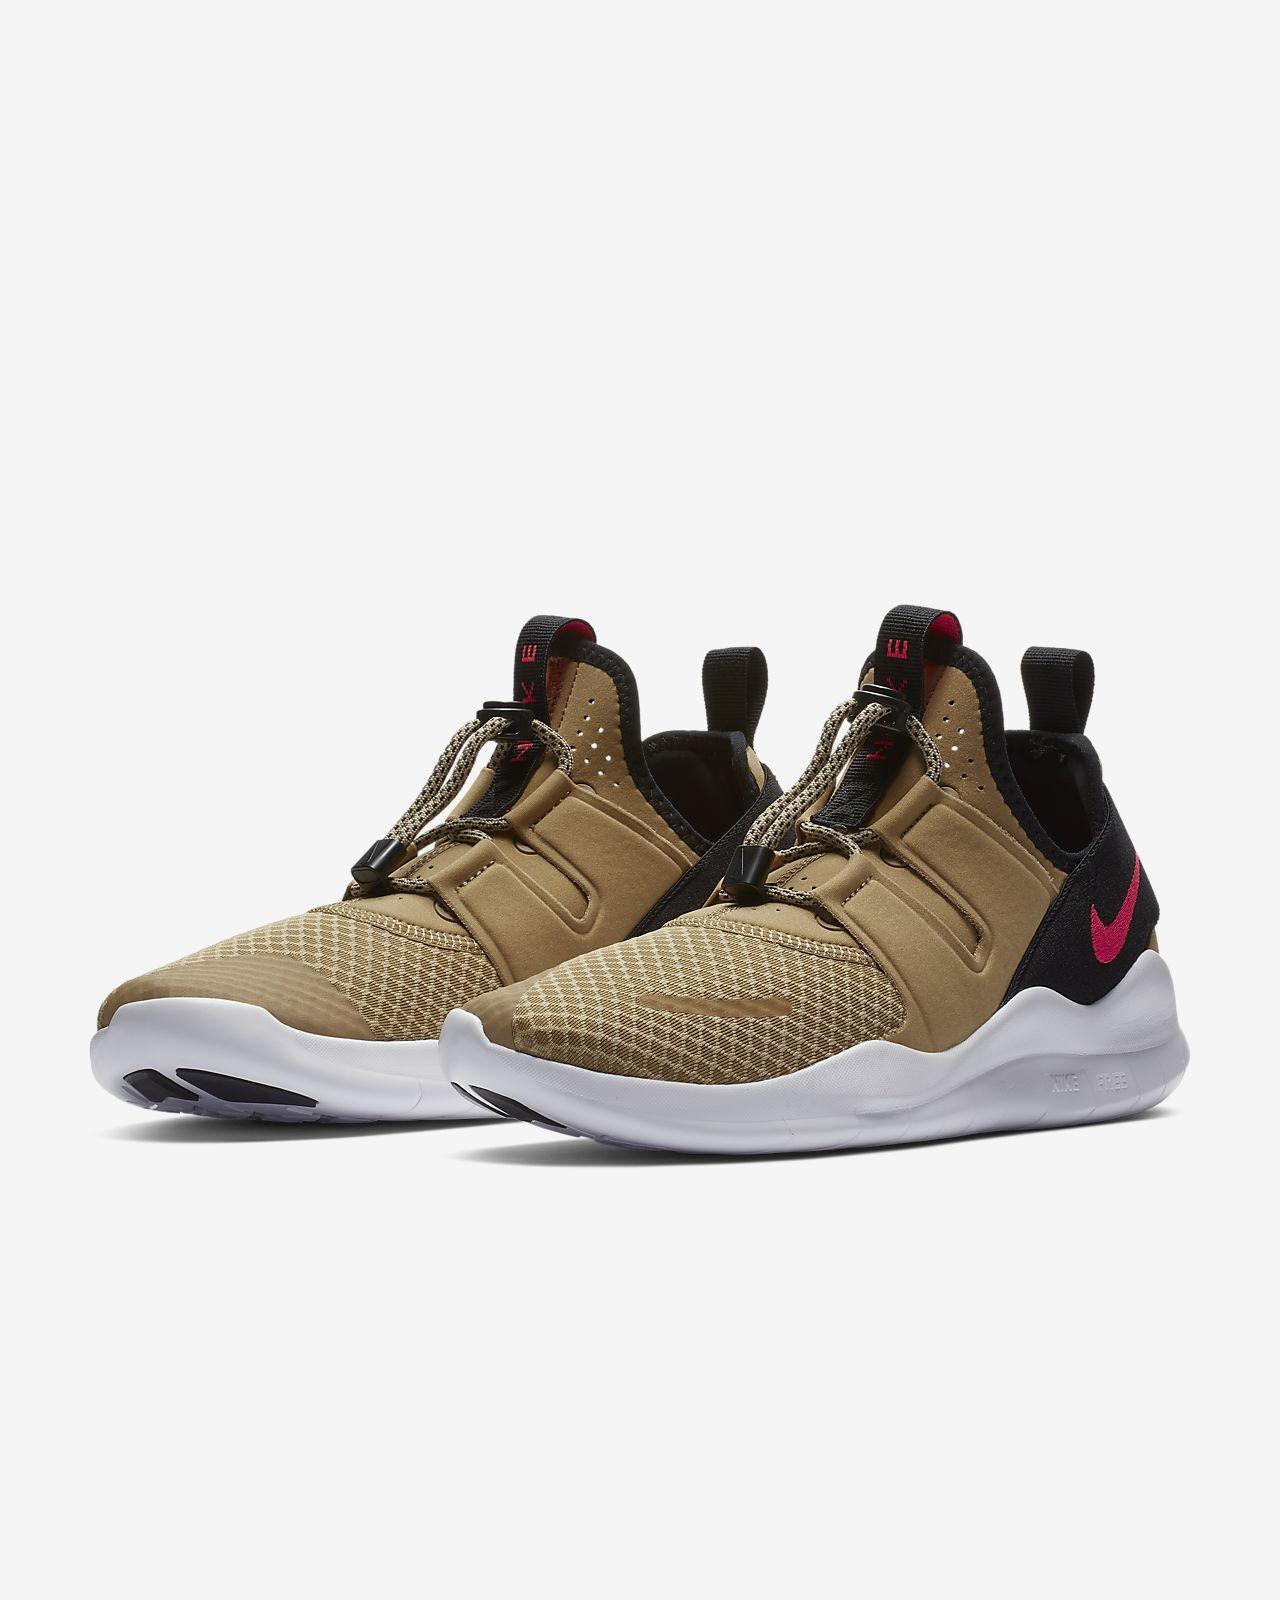 8668ea1d770 Nike Free RN Commuter 2018 Men s Running Shoe. Nike.com IN